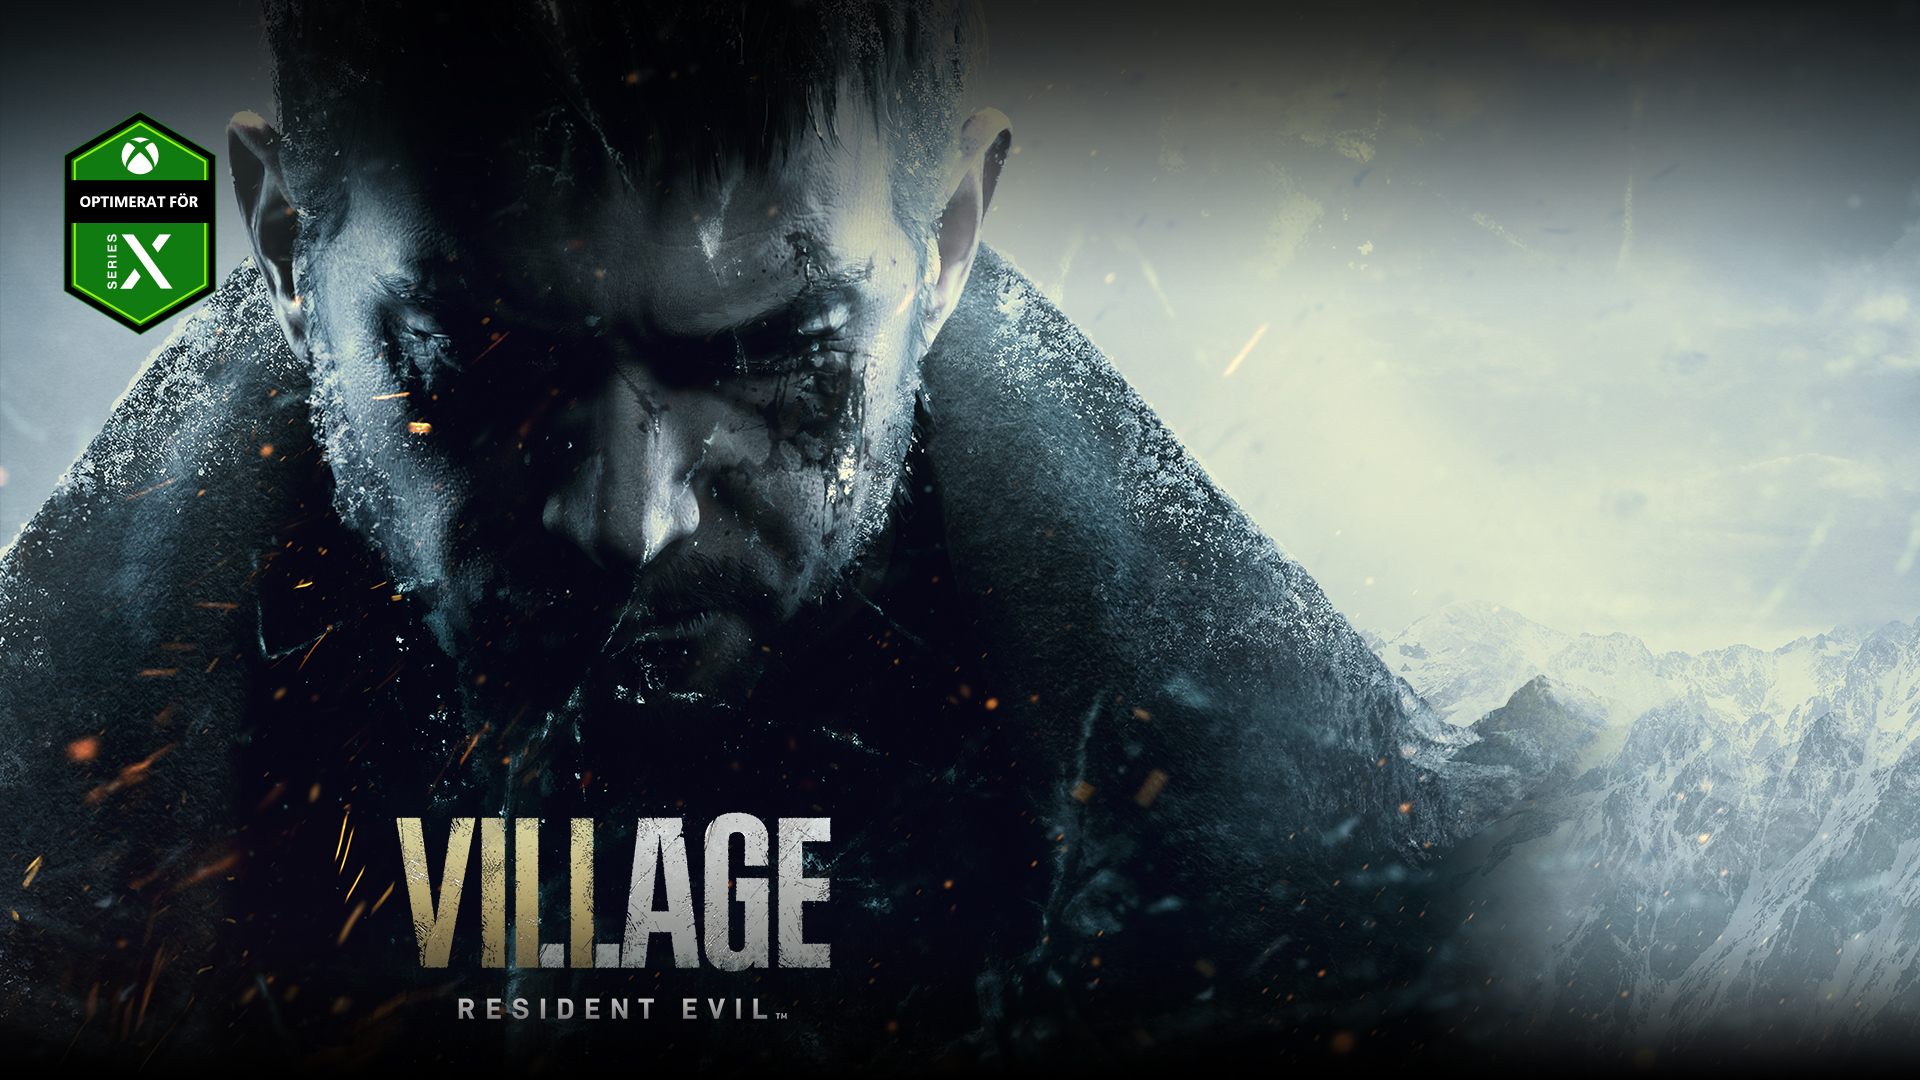 Resident Evil Village, Chris Redfields allvarliga ansikte på sidan av ett berg